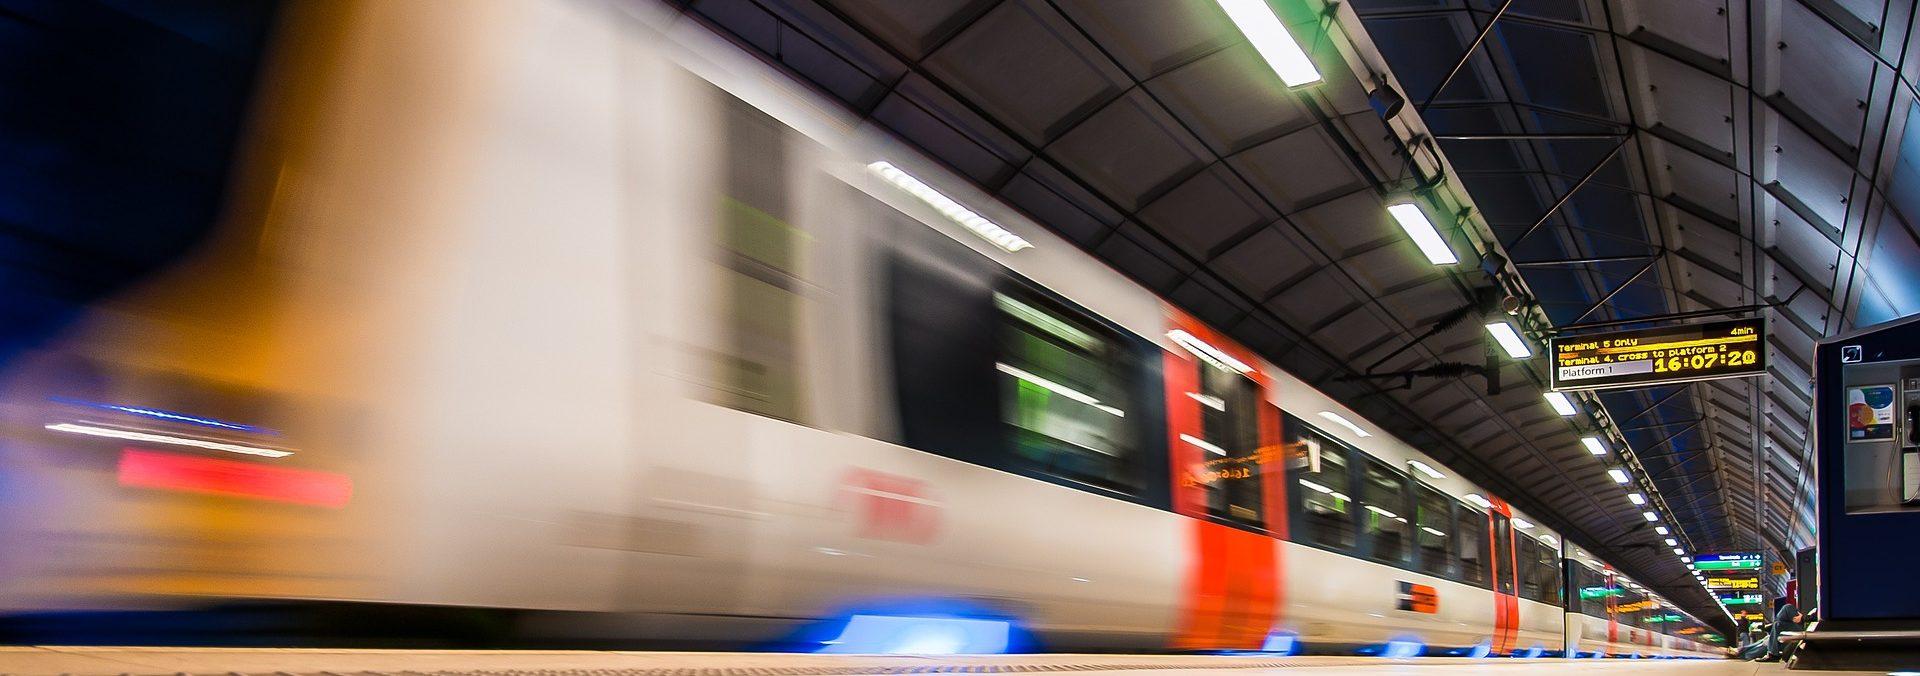 TOM SPIKE - Structured innovation - Railway Forum Berlin 2017